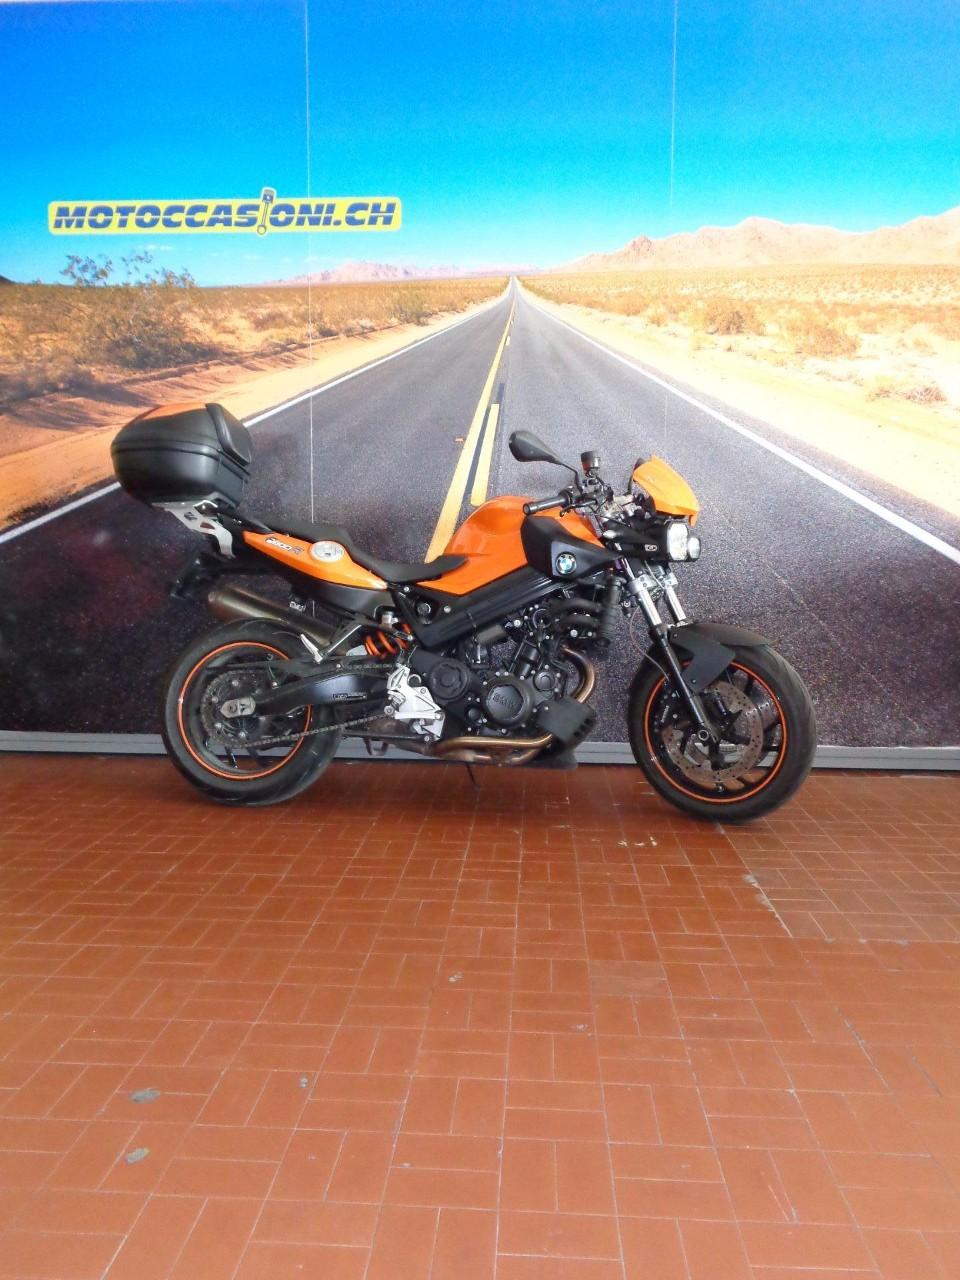 moto occasions acheter bmw f 800 r abs motoccasioni sa grancia. Black Bedroom Furniture Sets. Home Design Ideas